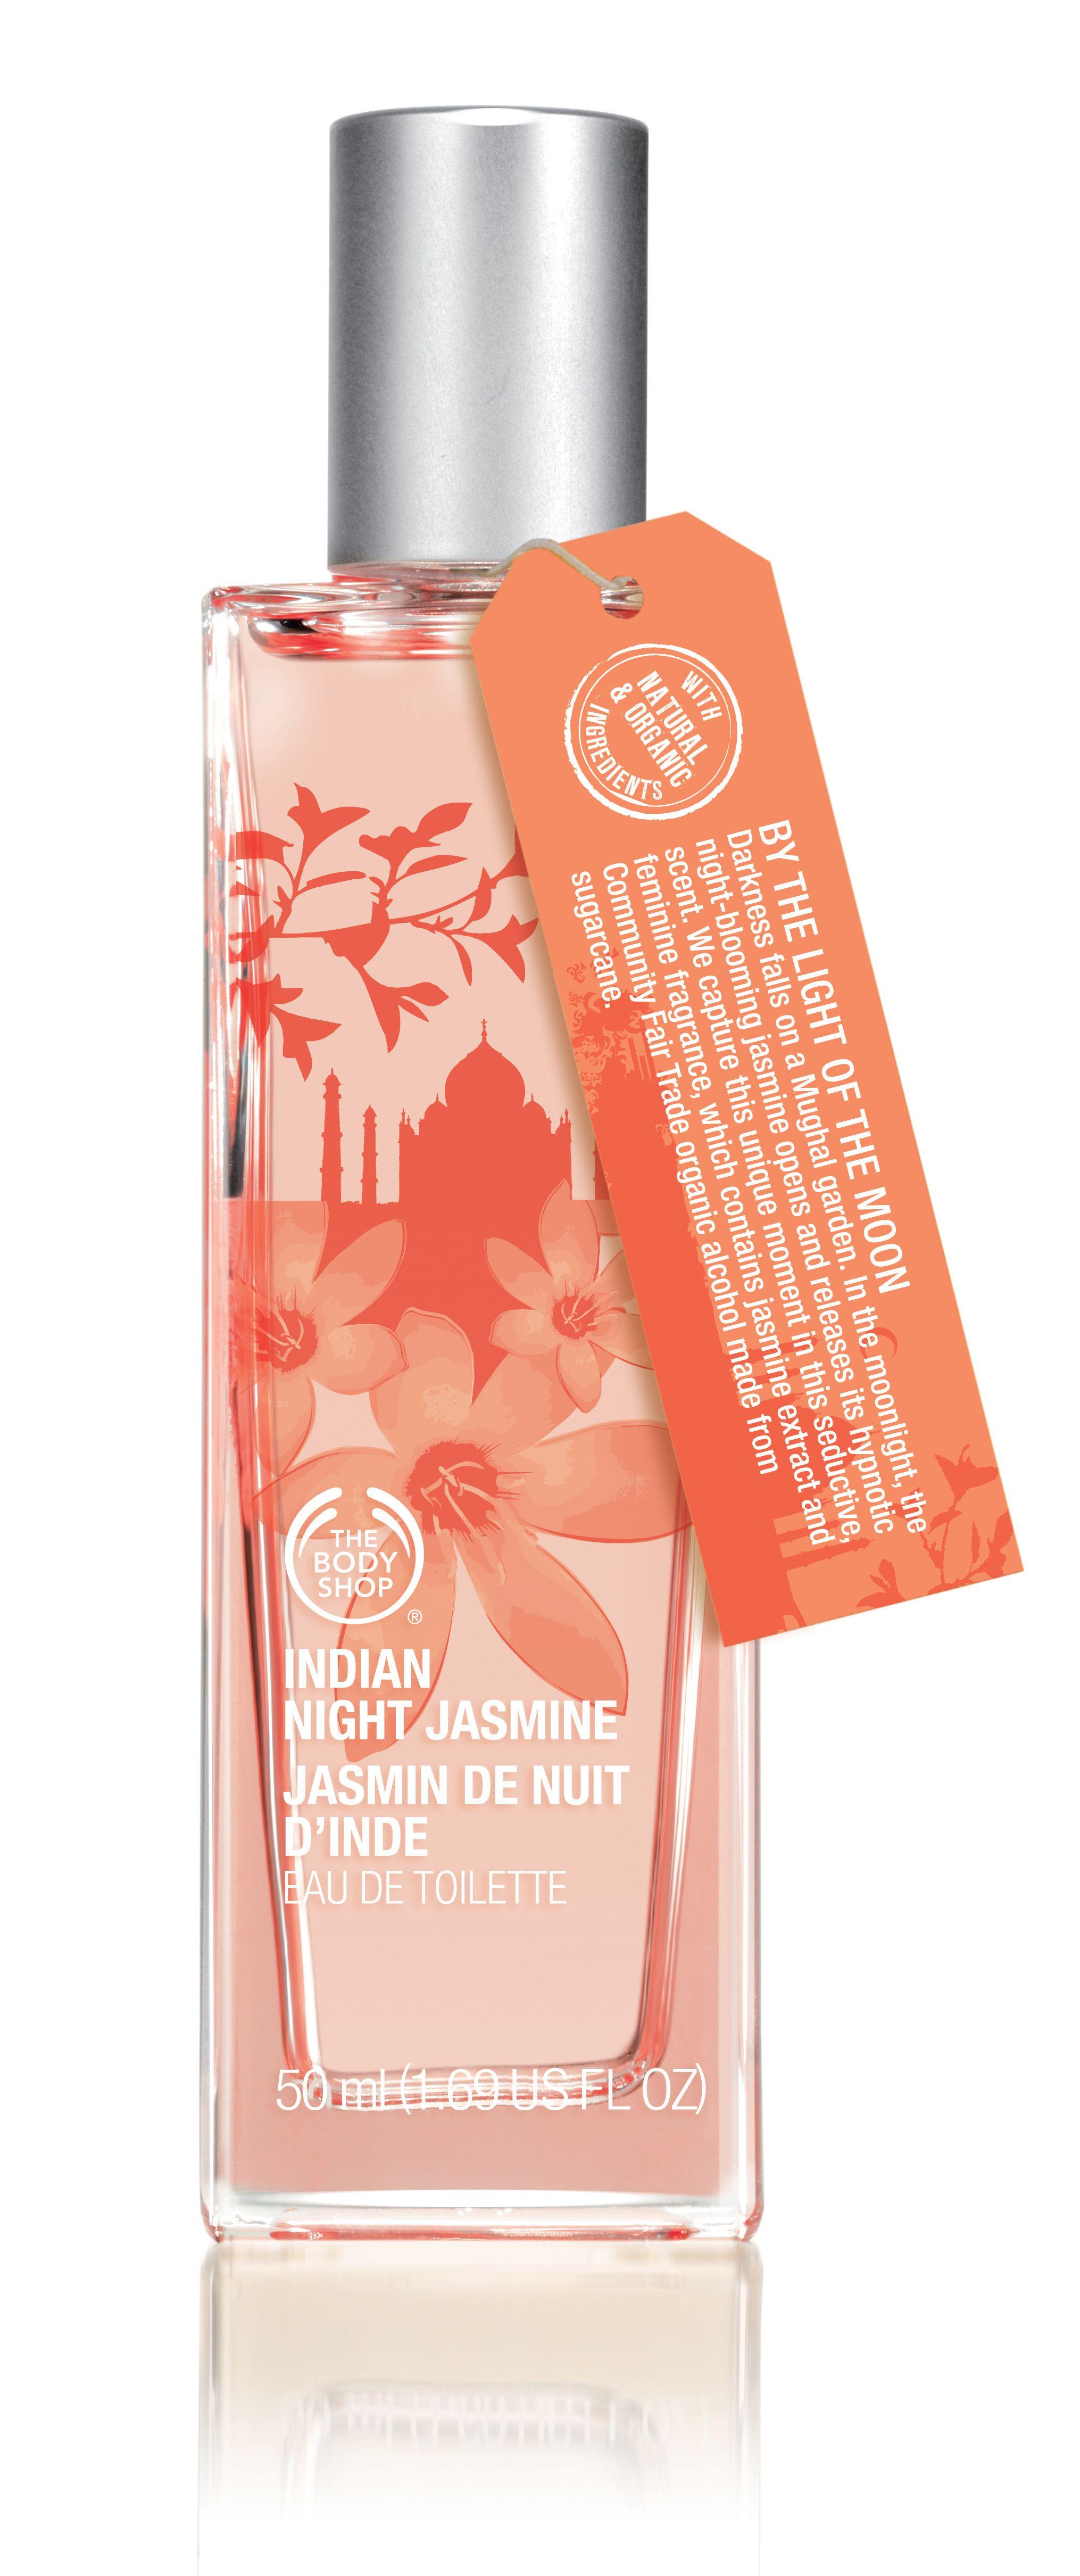 Indian night jasmine the body shop jasmine perfume scents